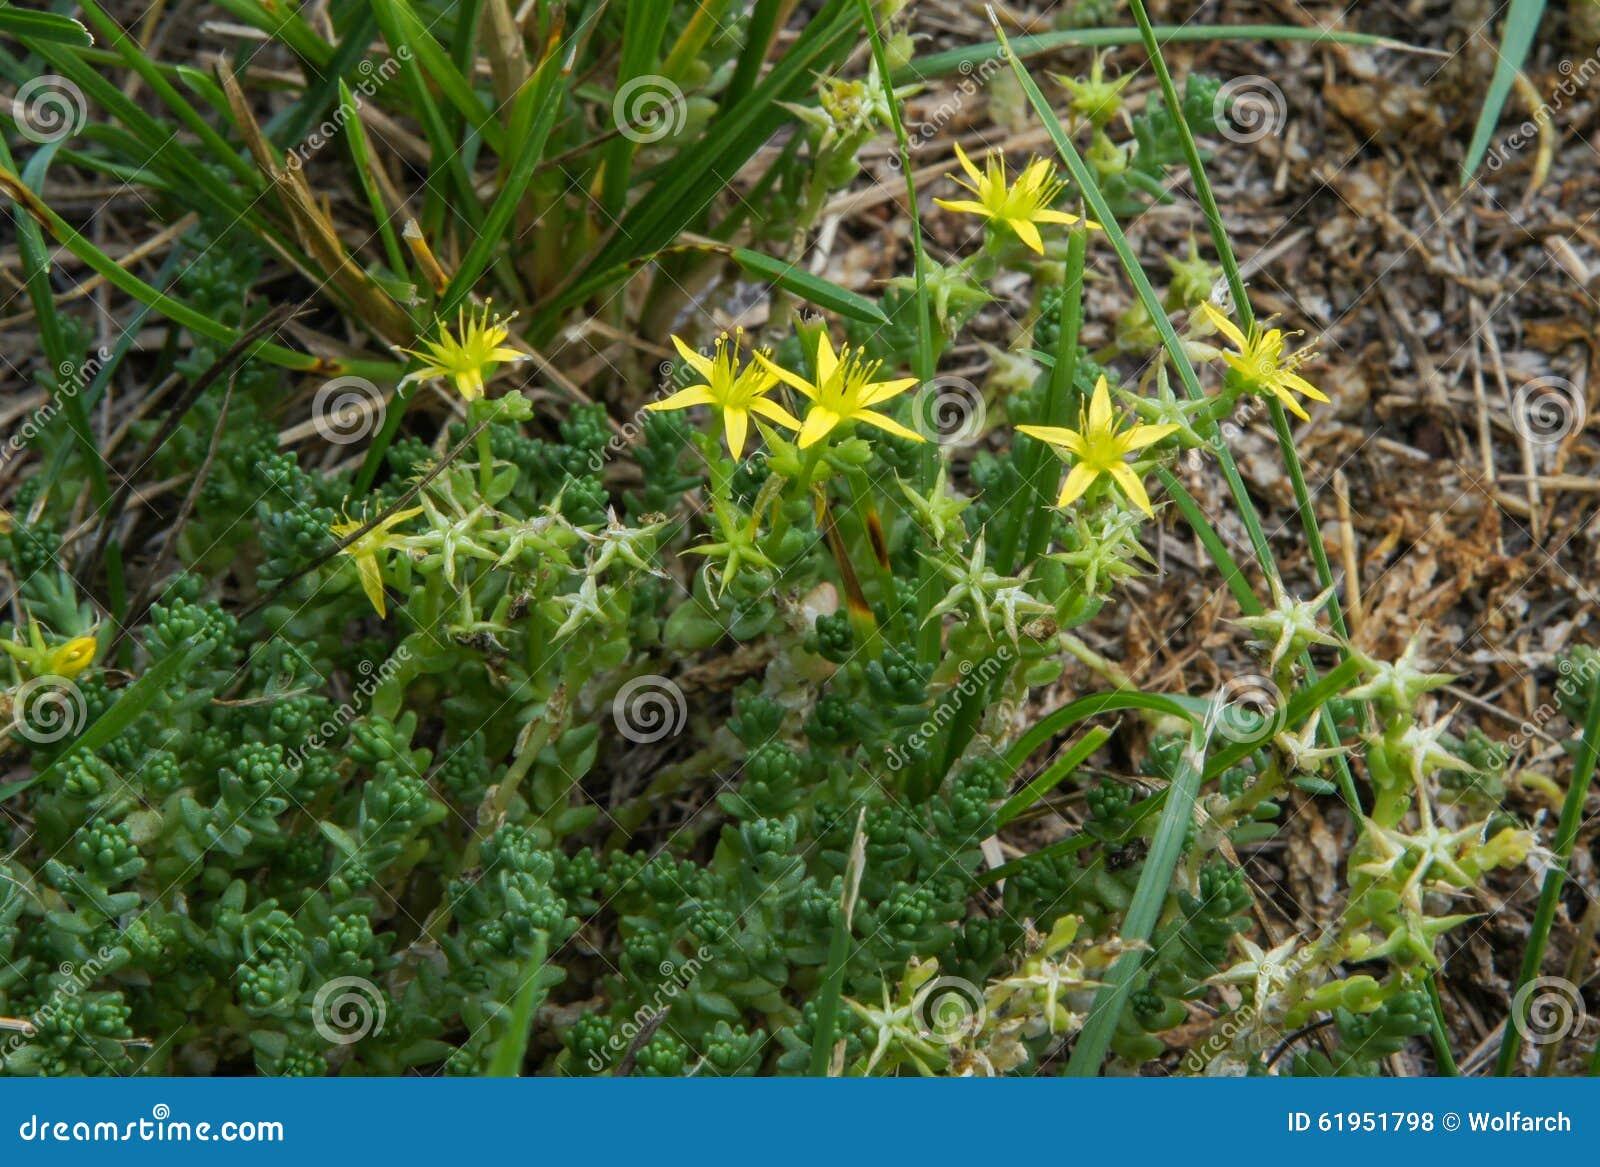 Yellow Flowers On Succulent Plant Stock Photo 61951798 Megapixl